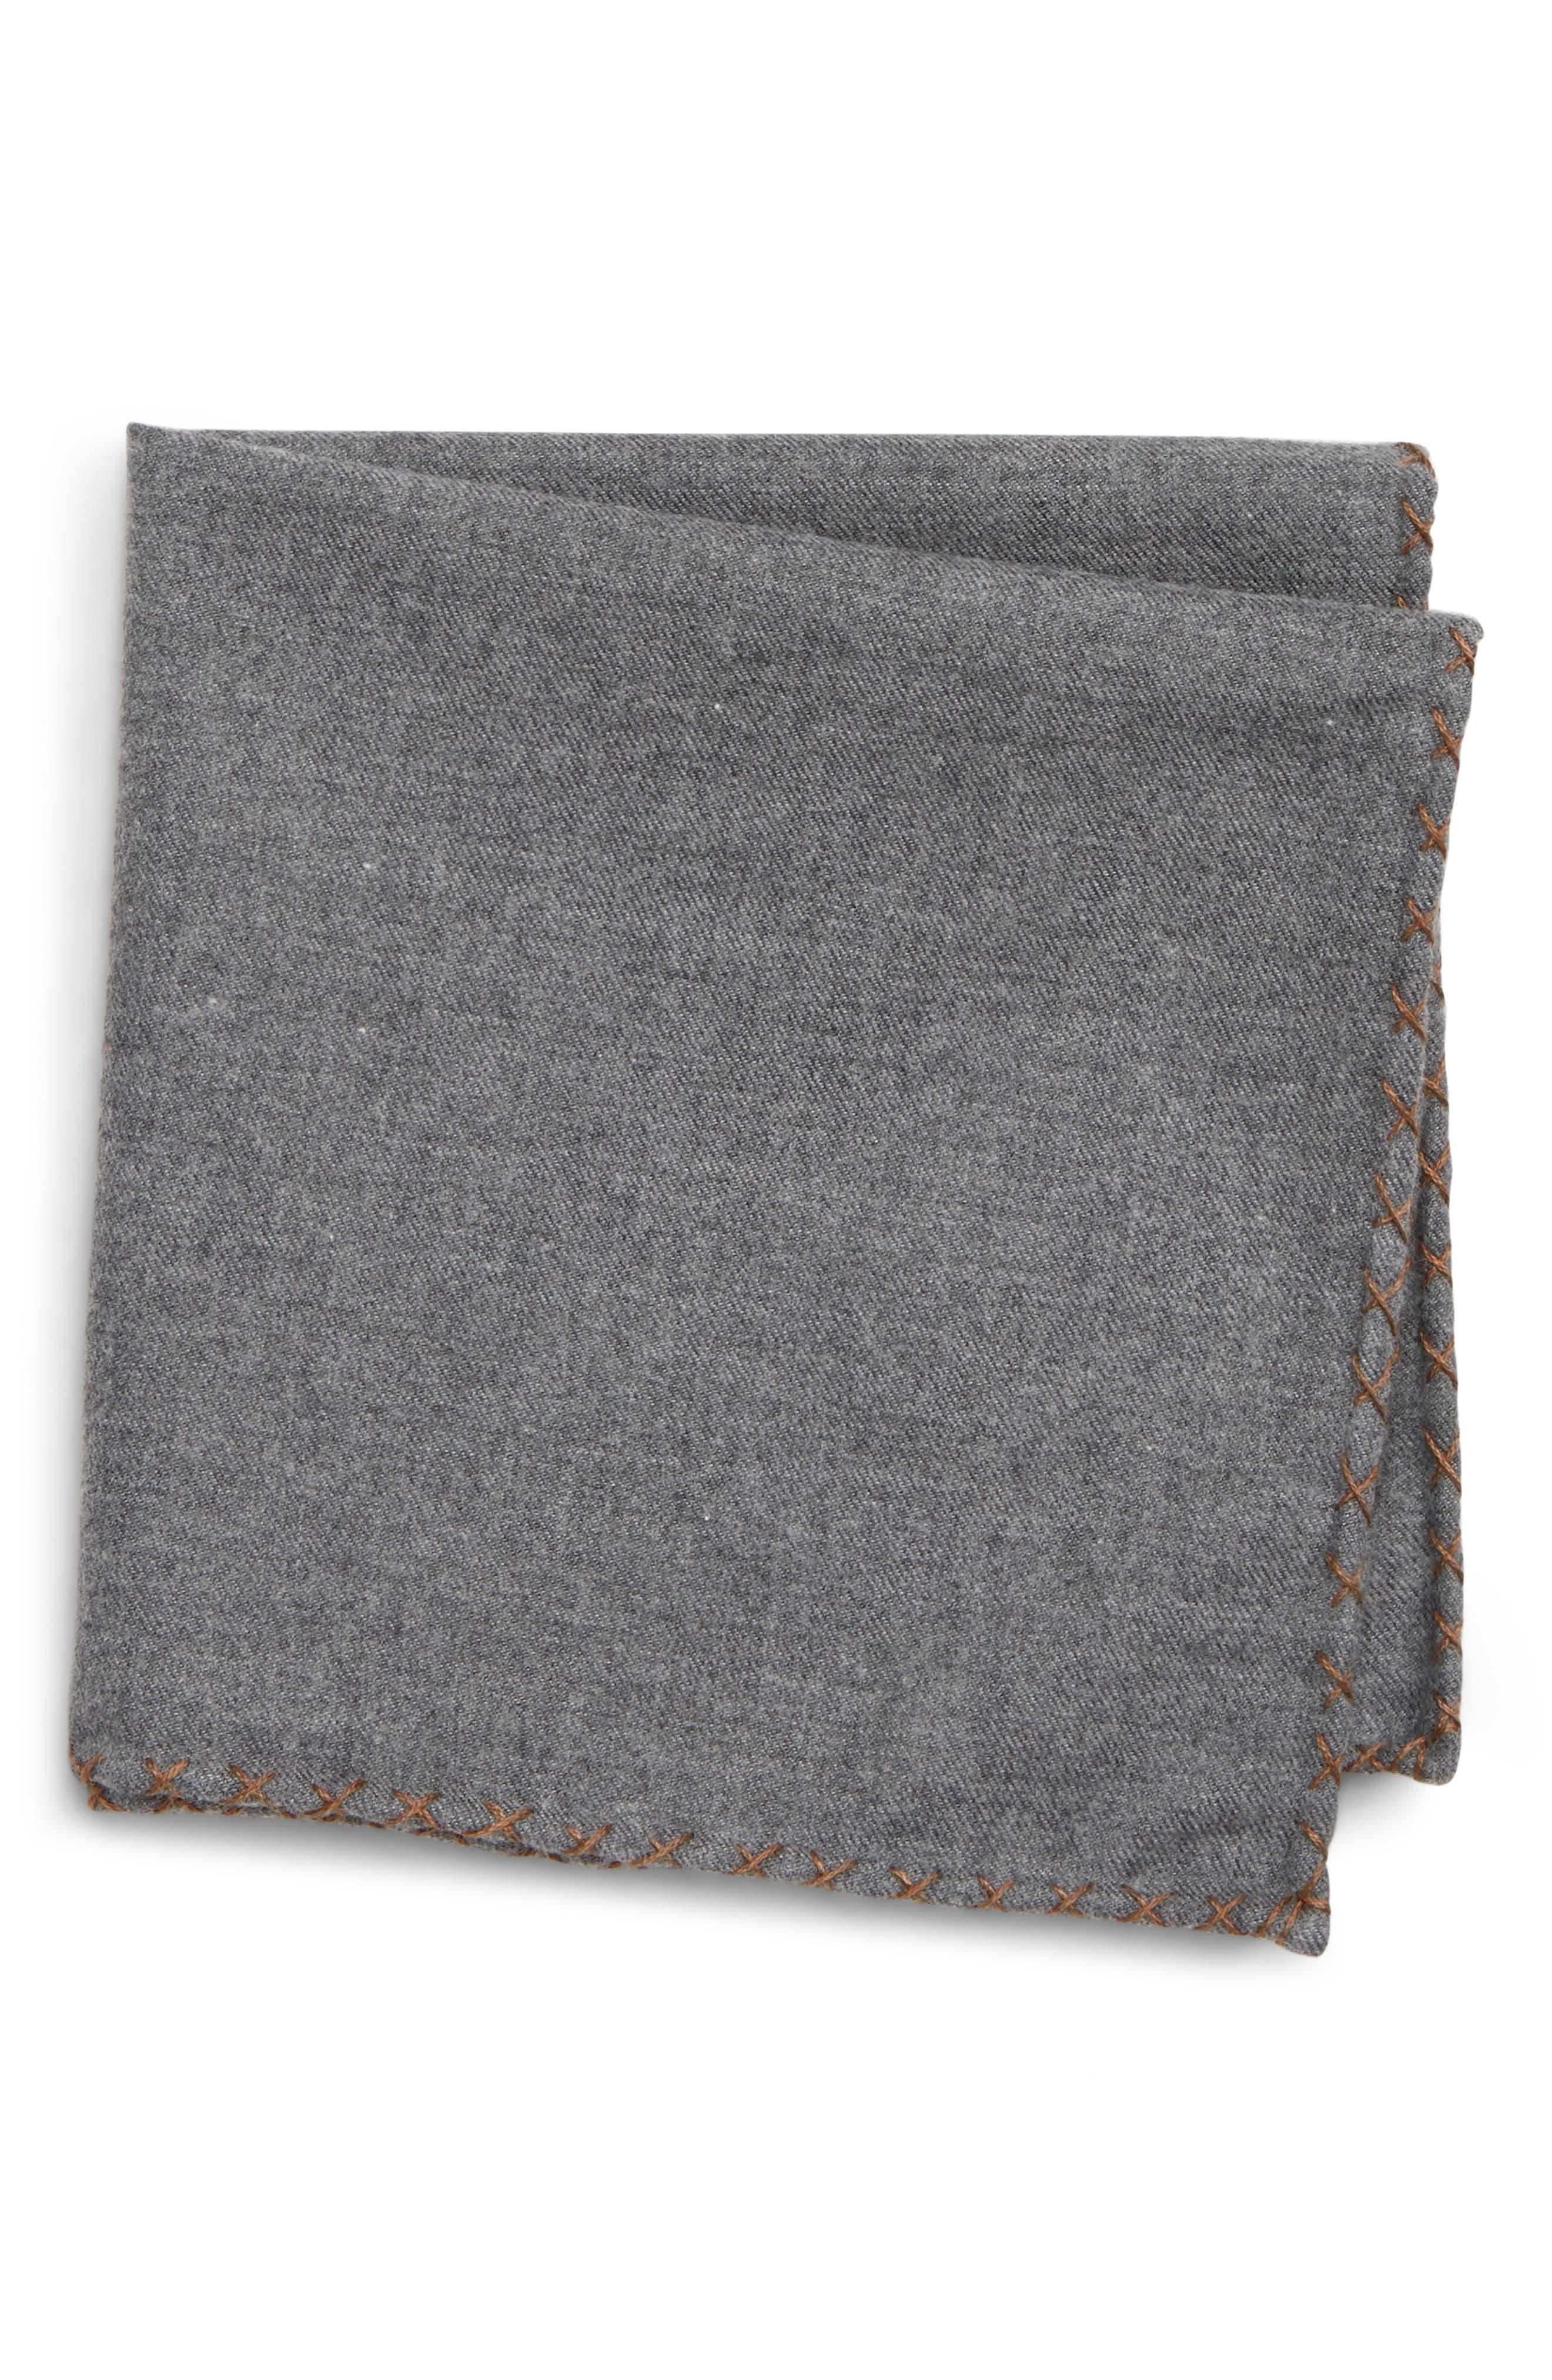 Solid Cotton Pocket Square,                             Main thumbnail 1, color,                             GREY/ CAMEL